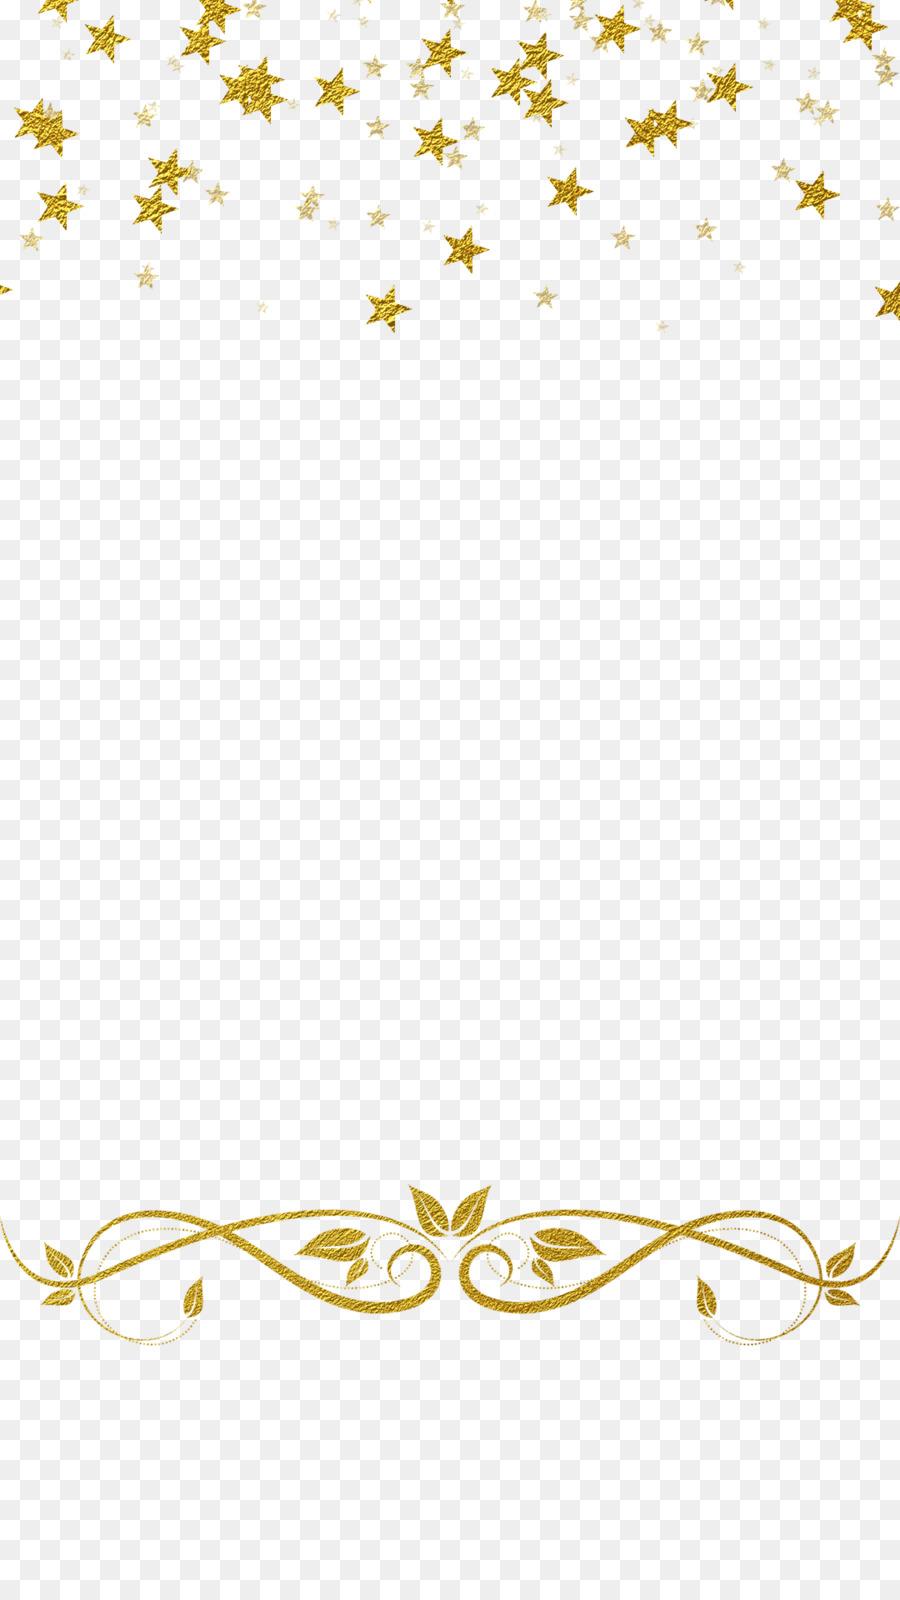 Snapchat wedding. Gold glitter border png